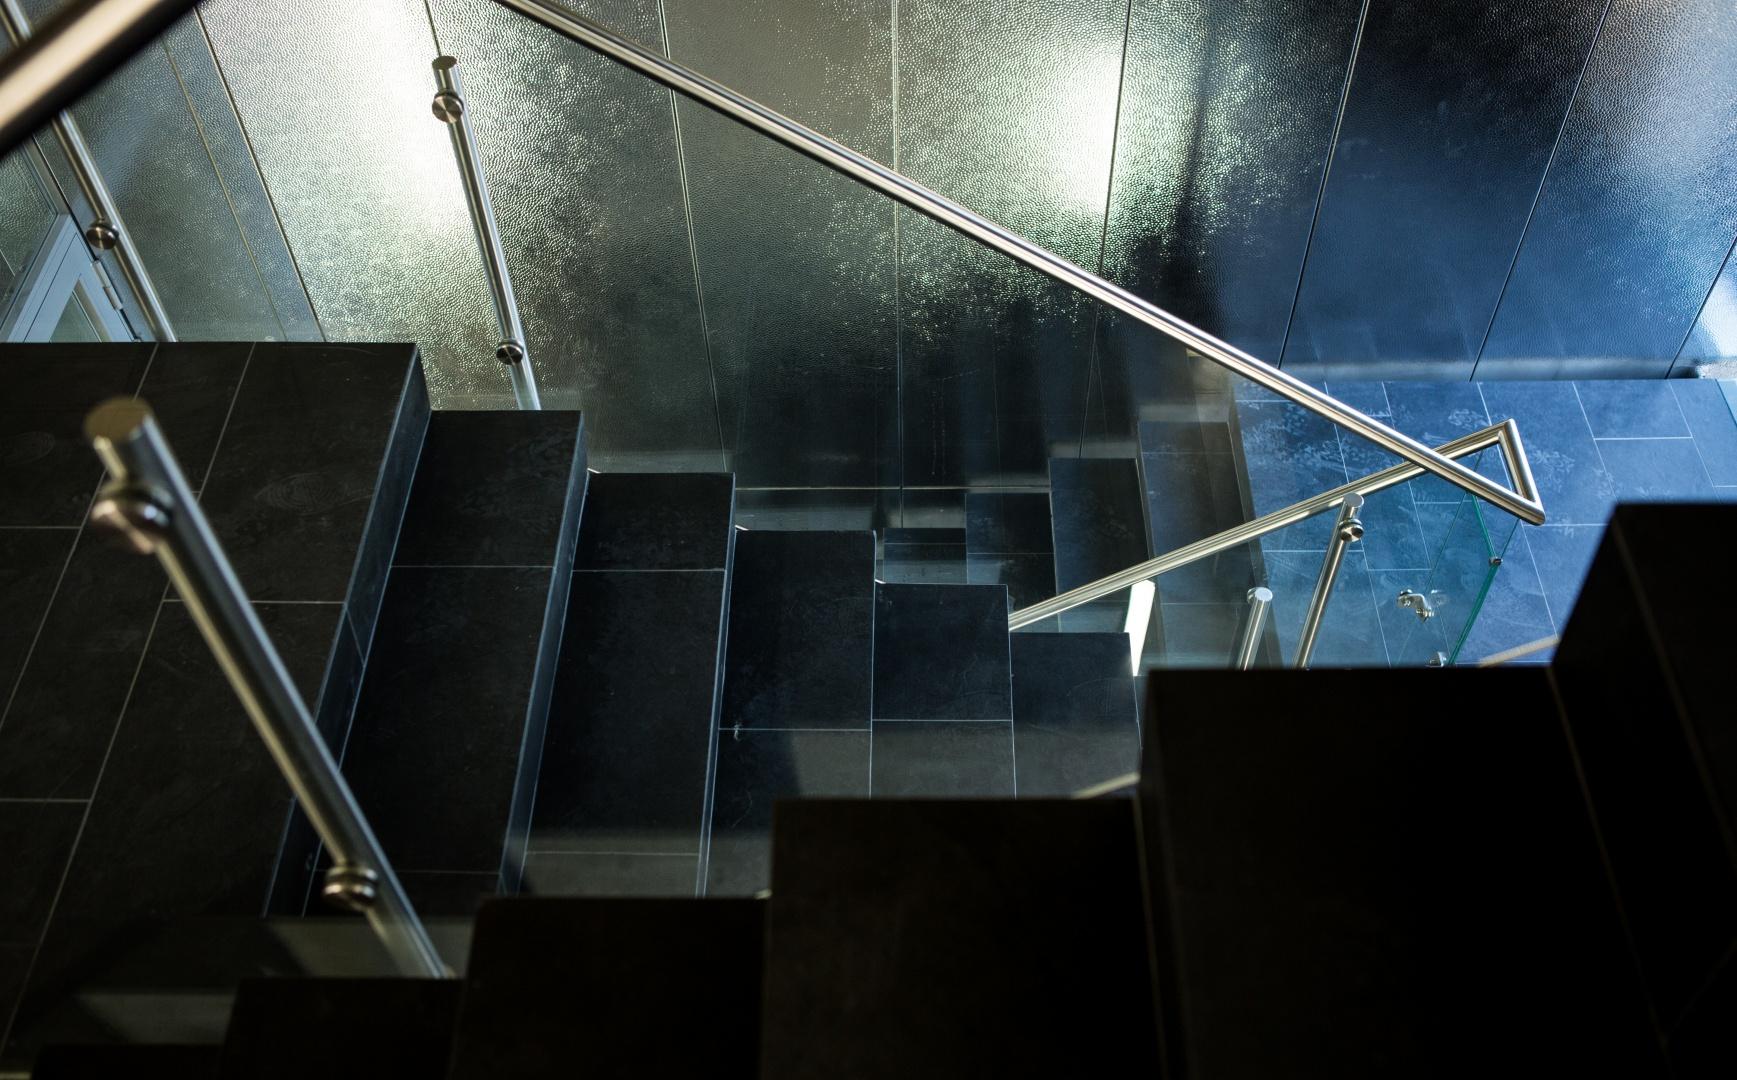 Treppenhaus Büroturm © Giorgia Müller